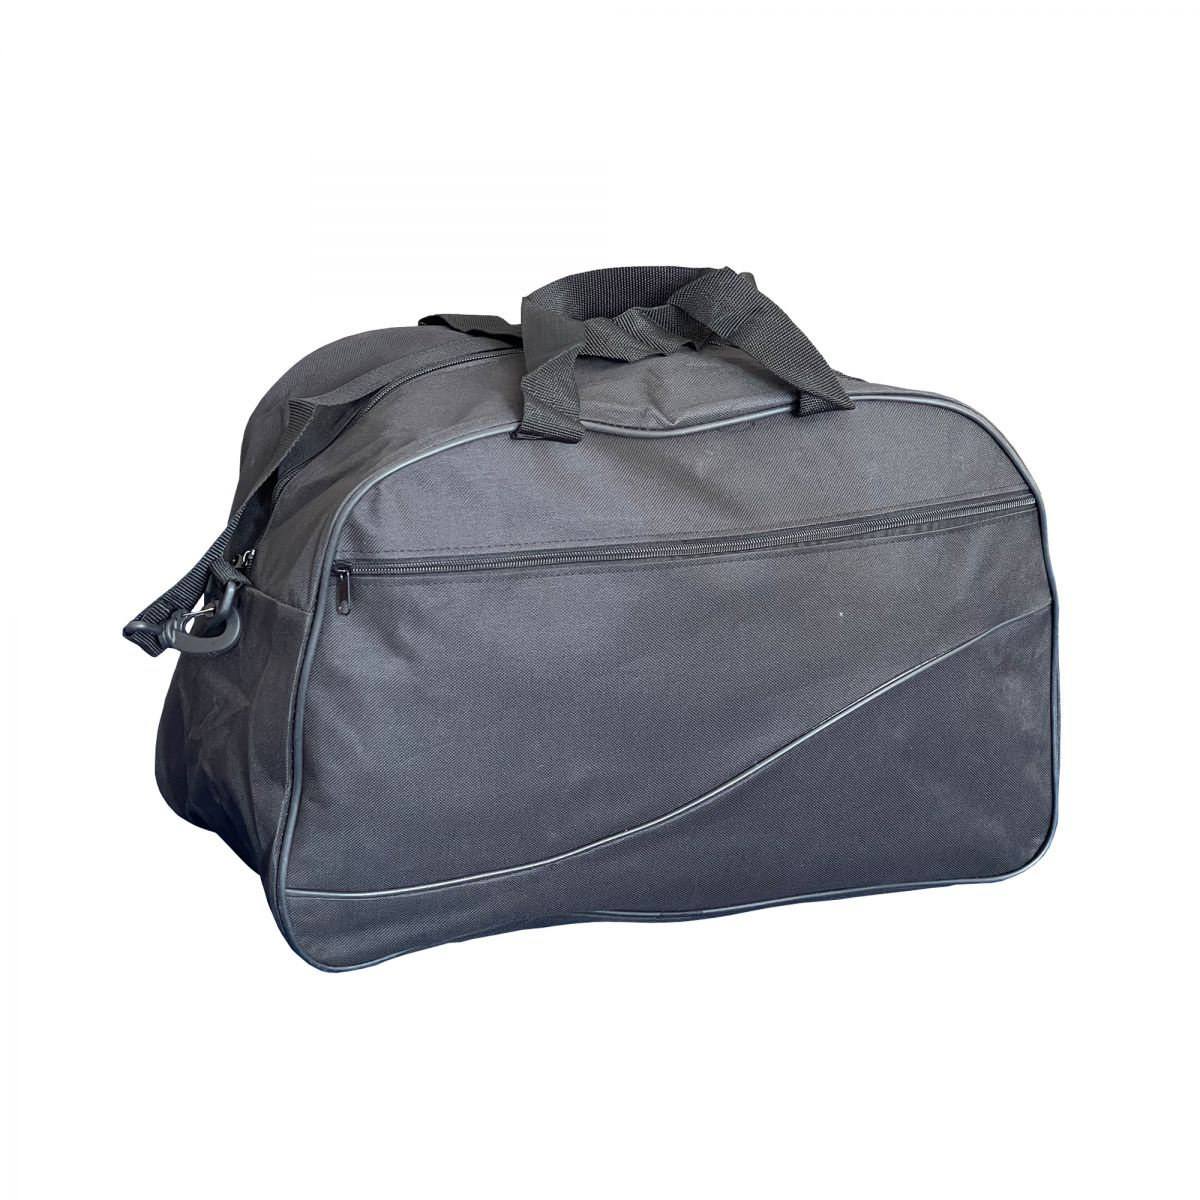 Geanta calatorie negru Homs 52x20x35 cm